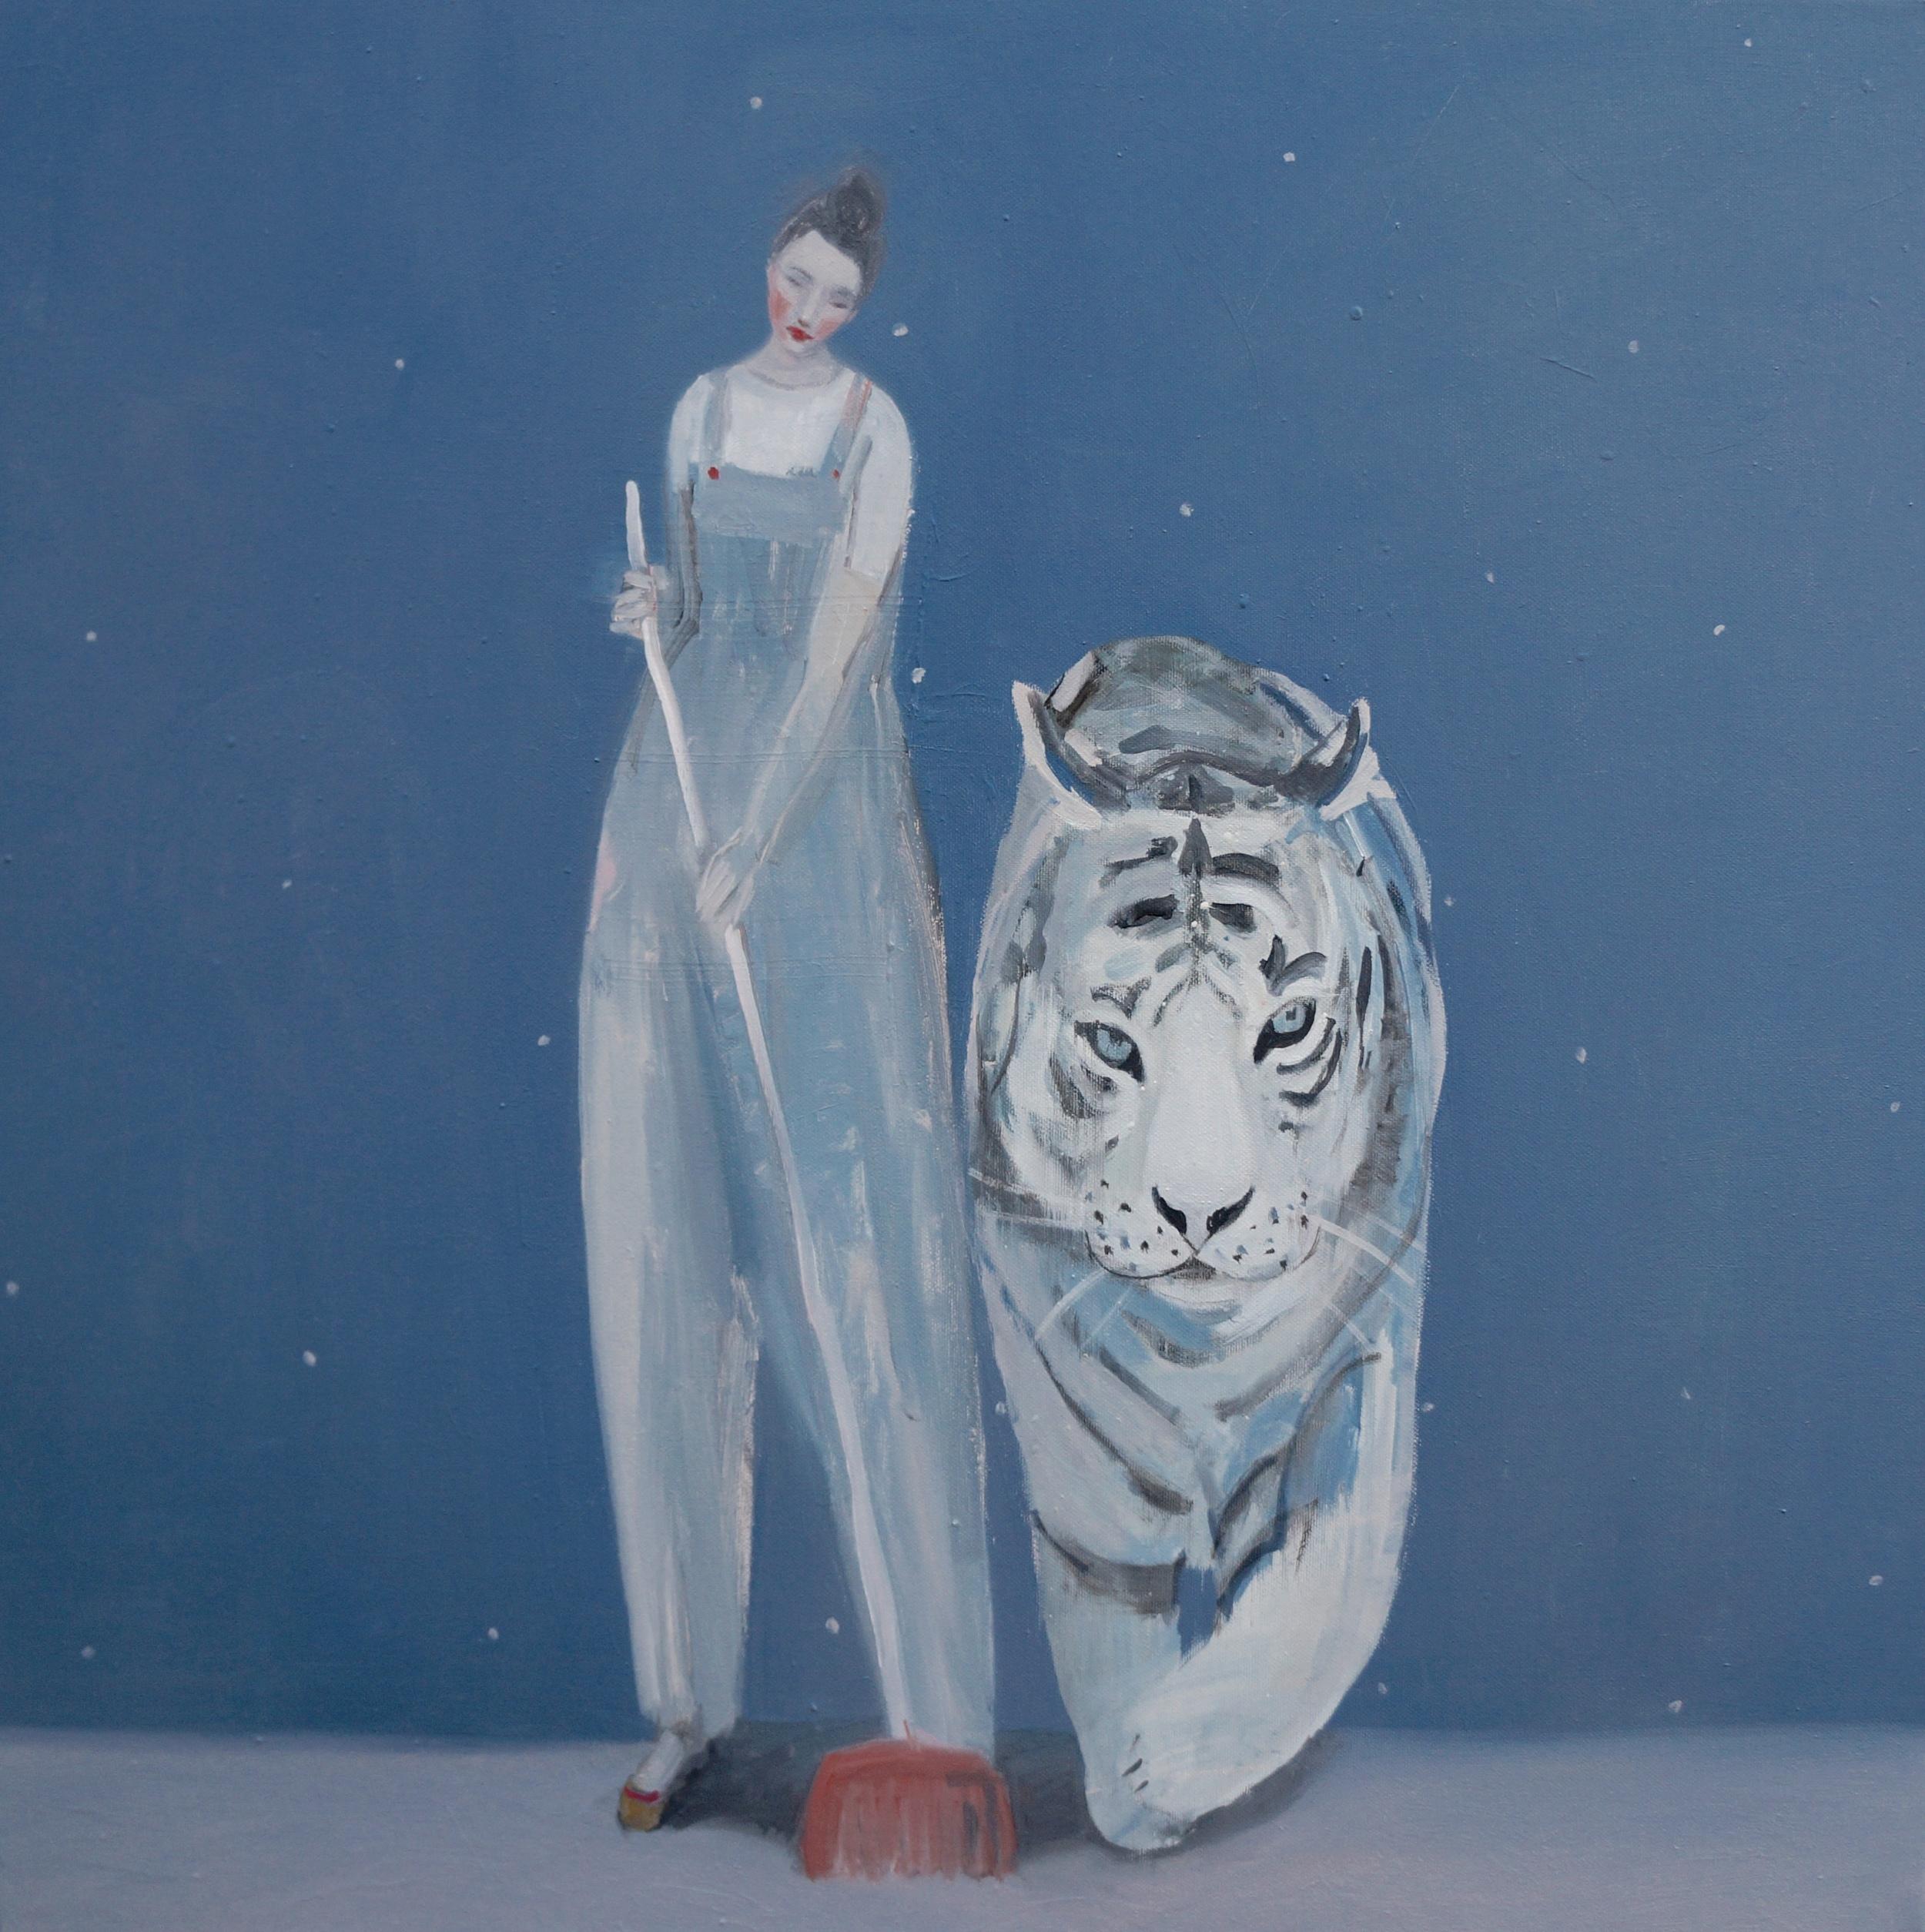 Kristin Vestgard Each Others oil on canvas 70 x 70 cm £ 3000